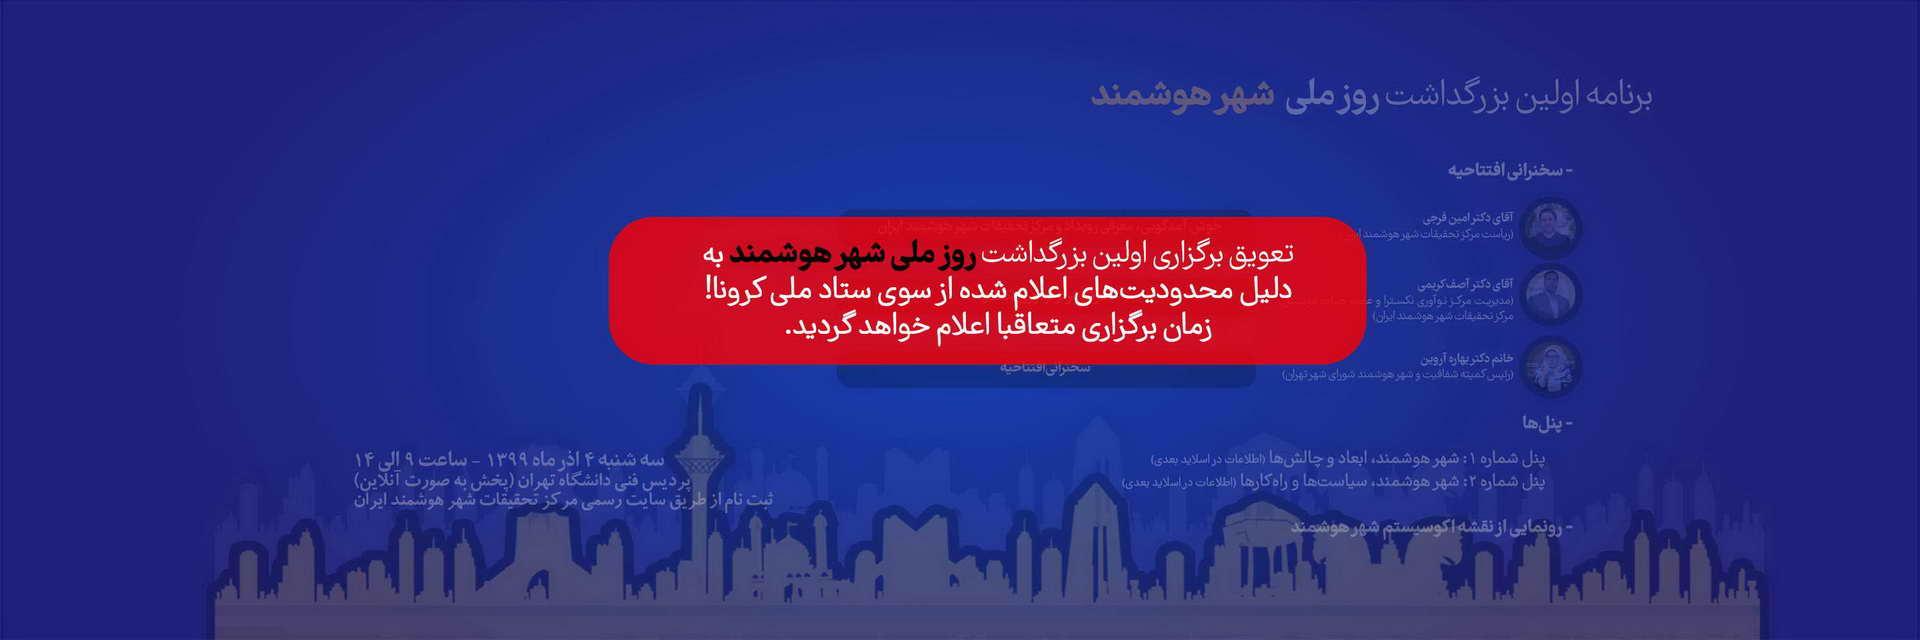 990901-Website Banner-تعویق برگزاری روز ملی شهر هوشمند-R00